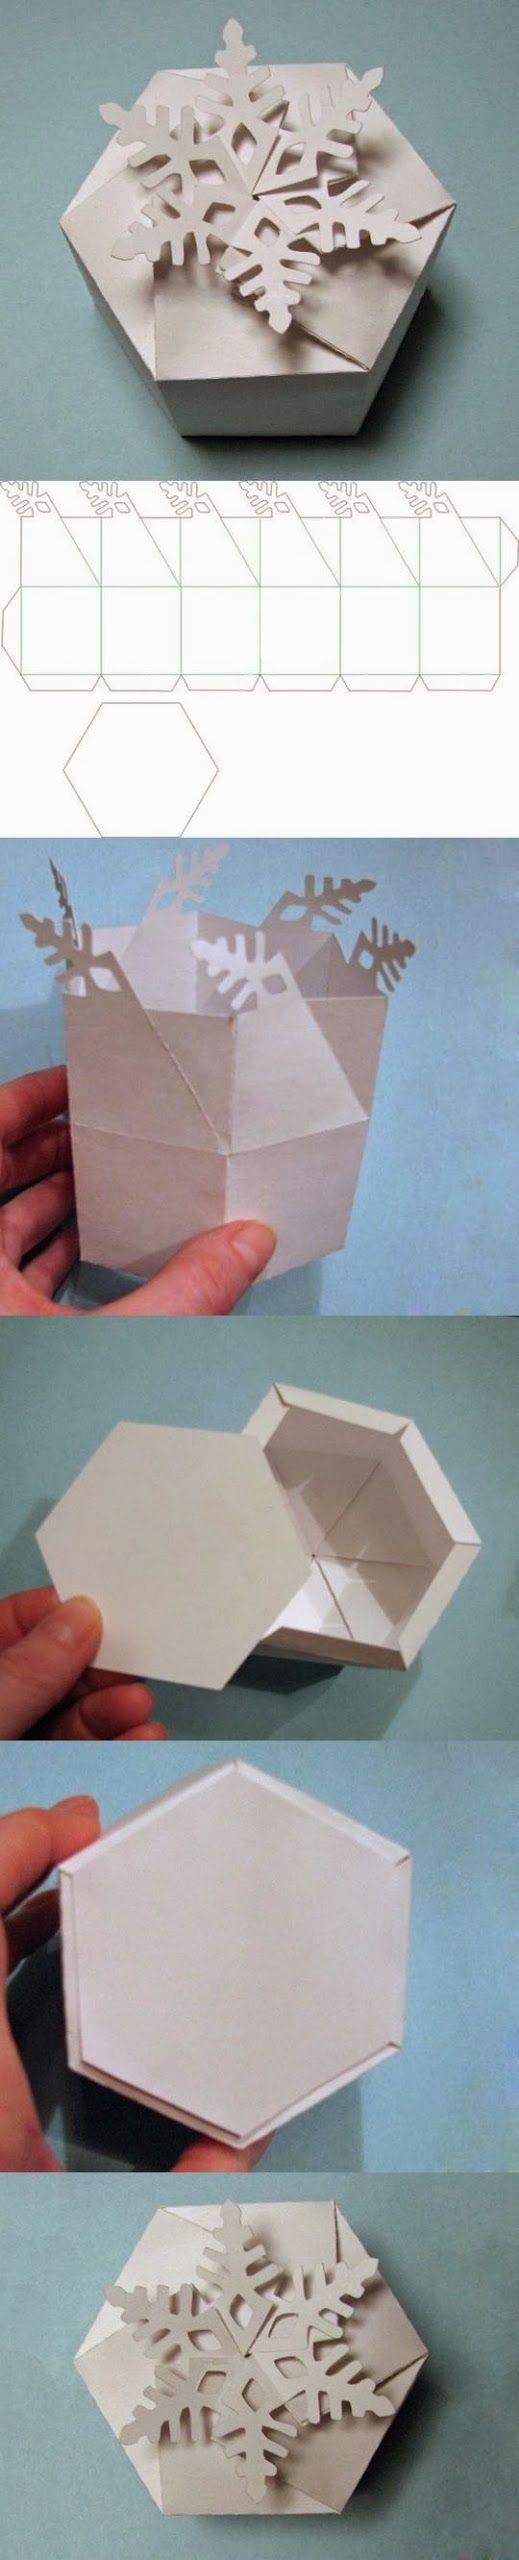 DIY : Snowflake Gift Box | DIY & Crafts Tutorials